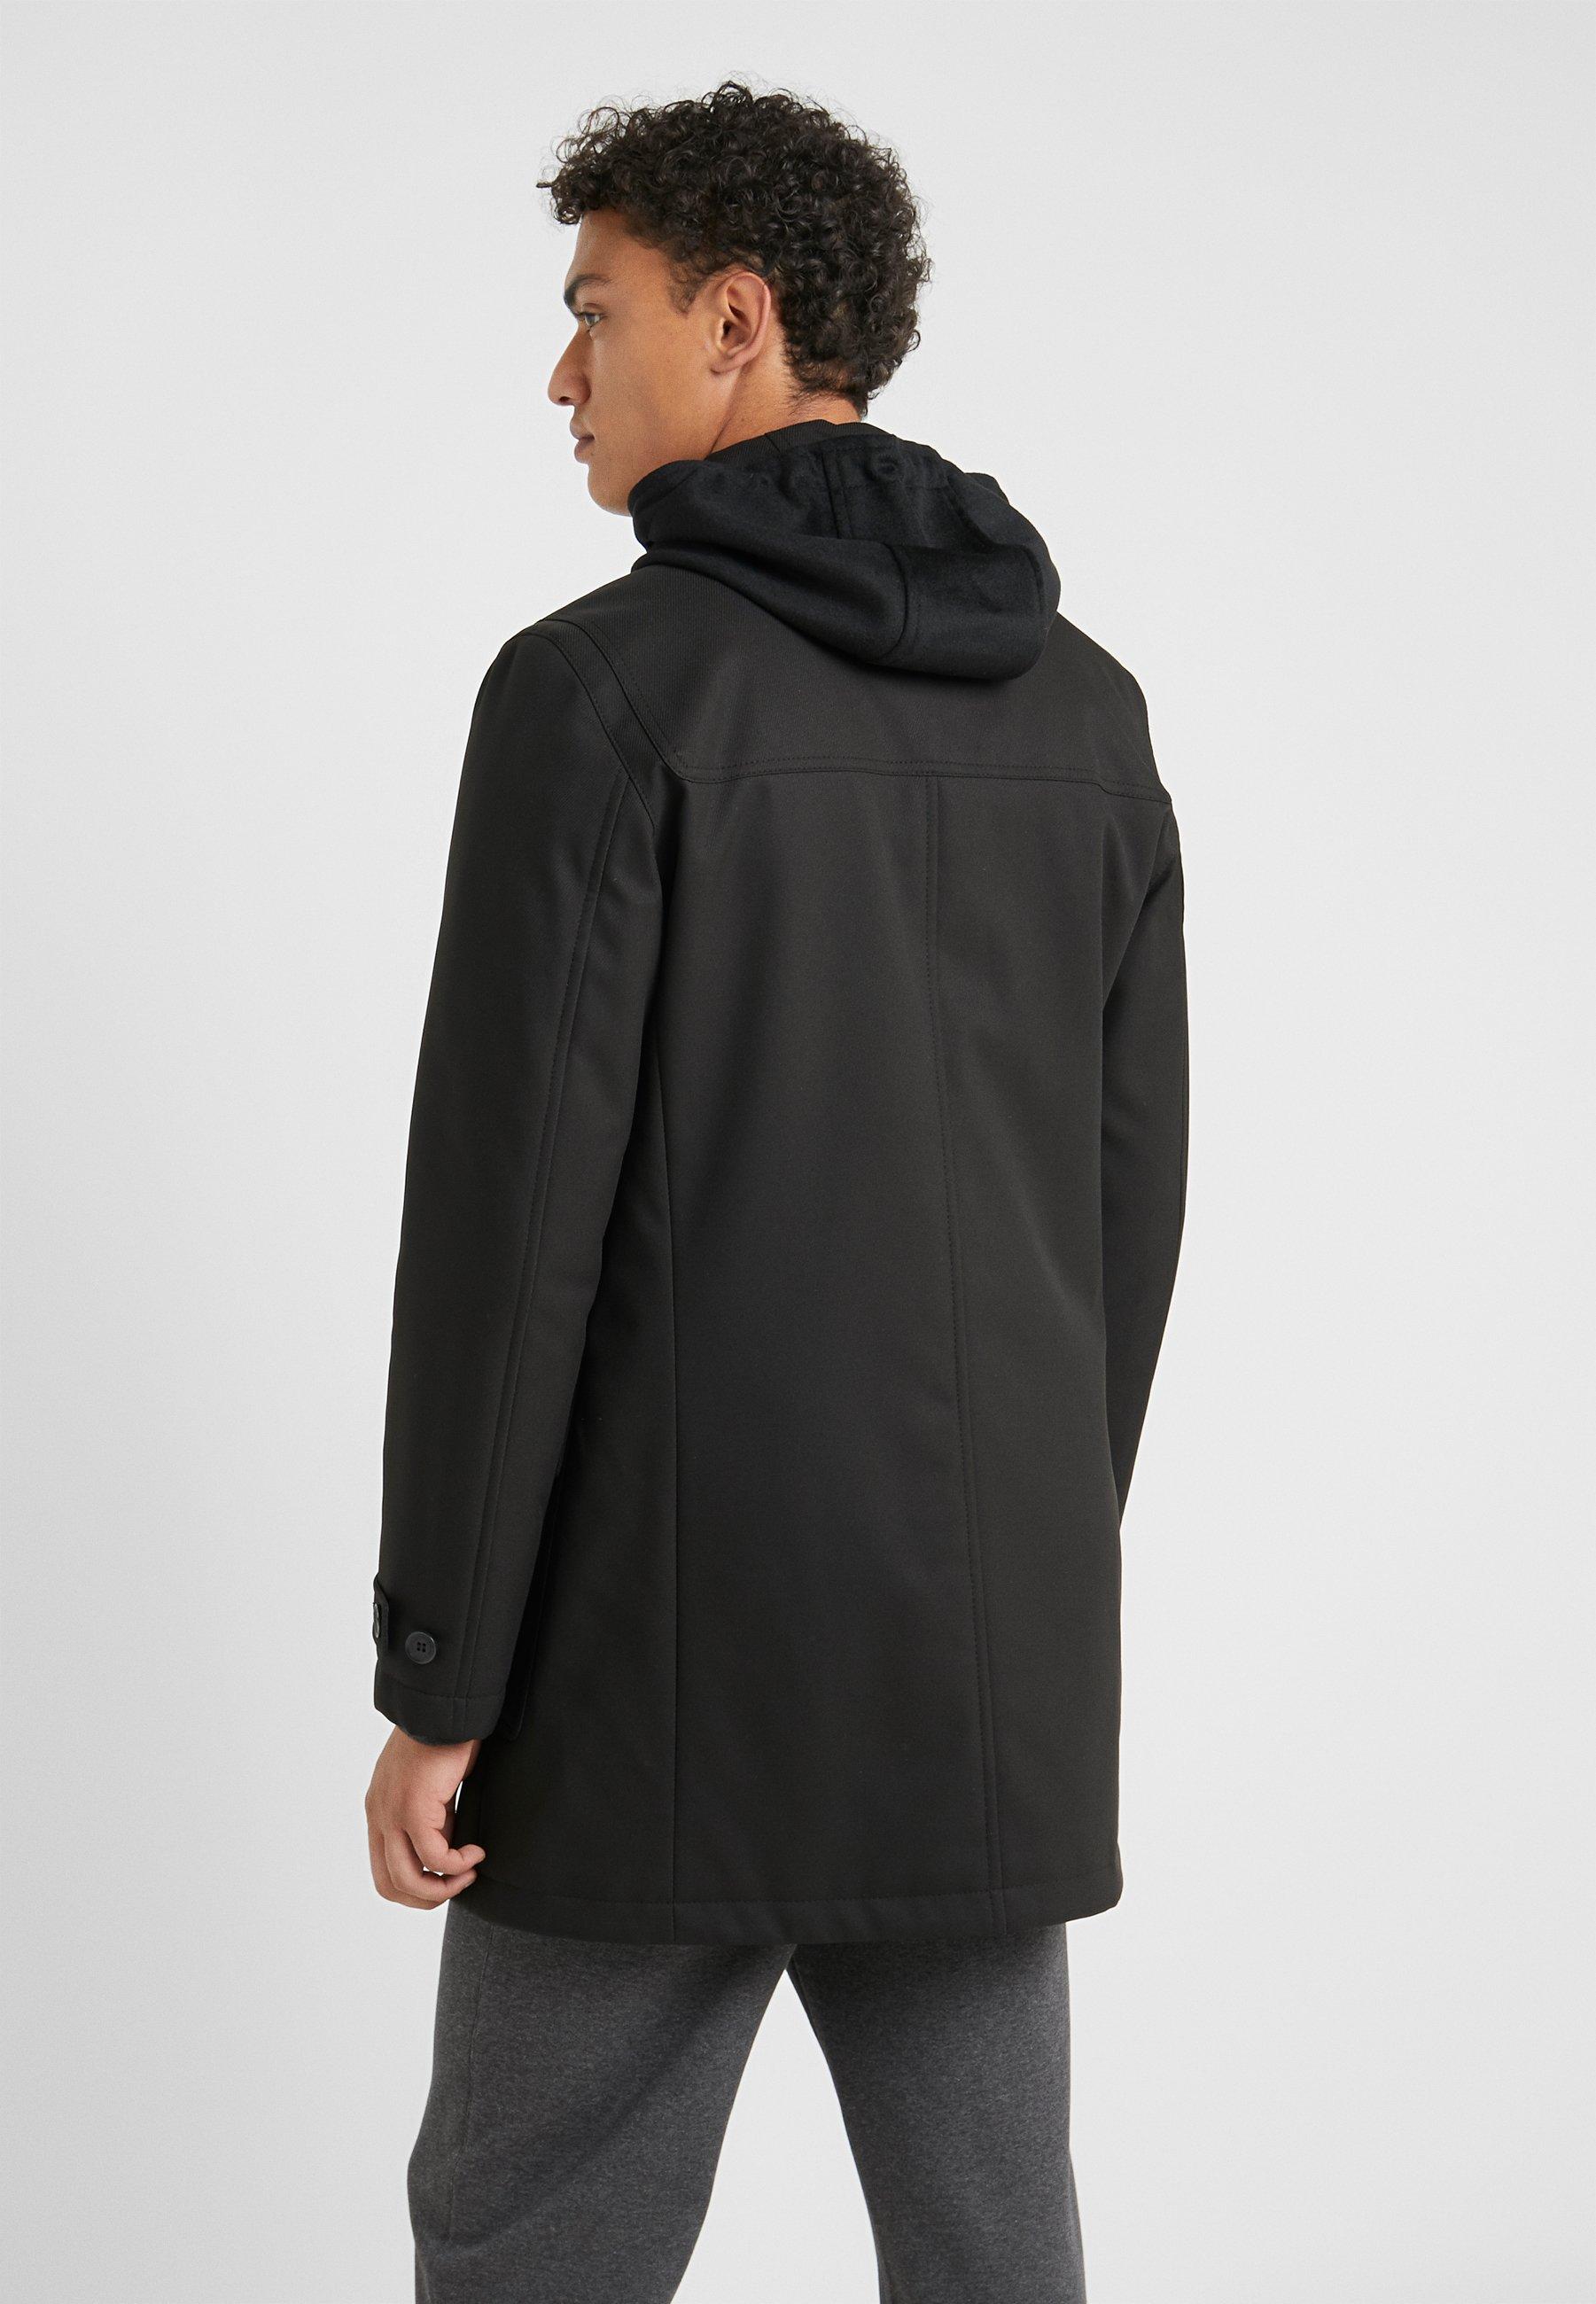 Cc CarcoatManteau Court Corneliani Black Collection DI9WEY2H